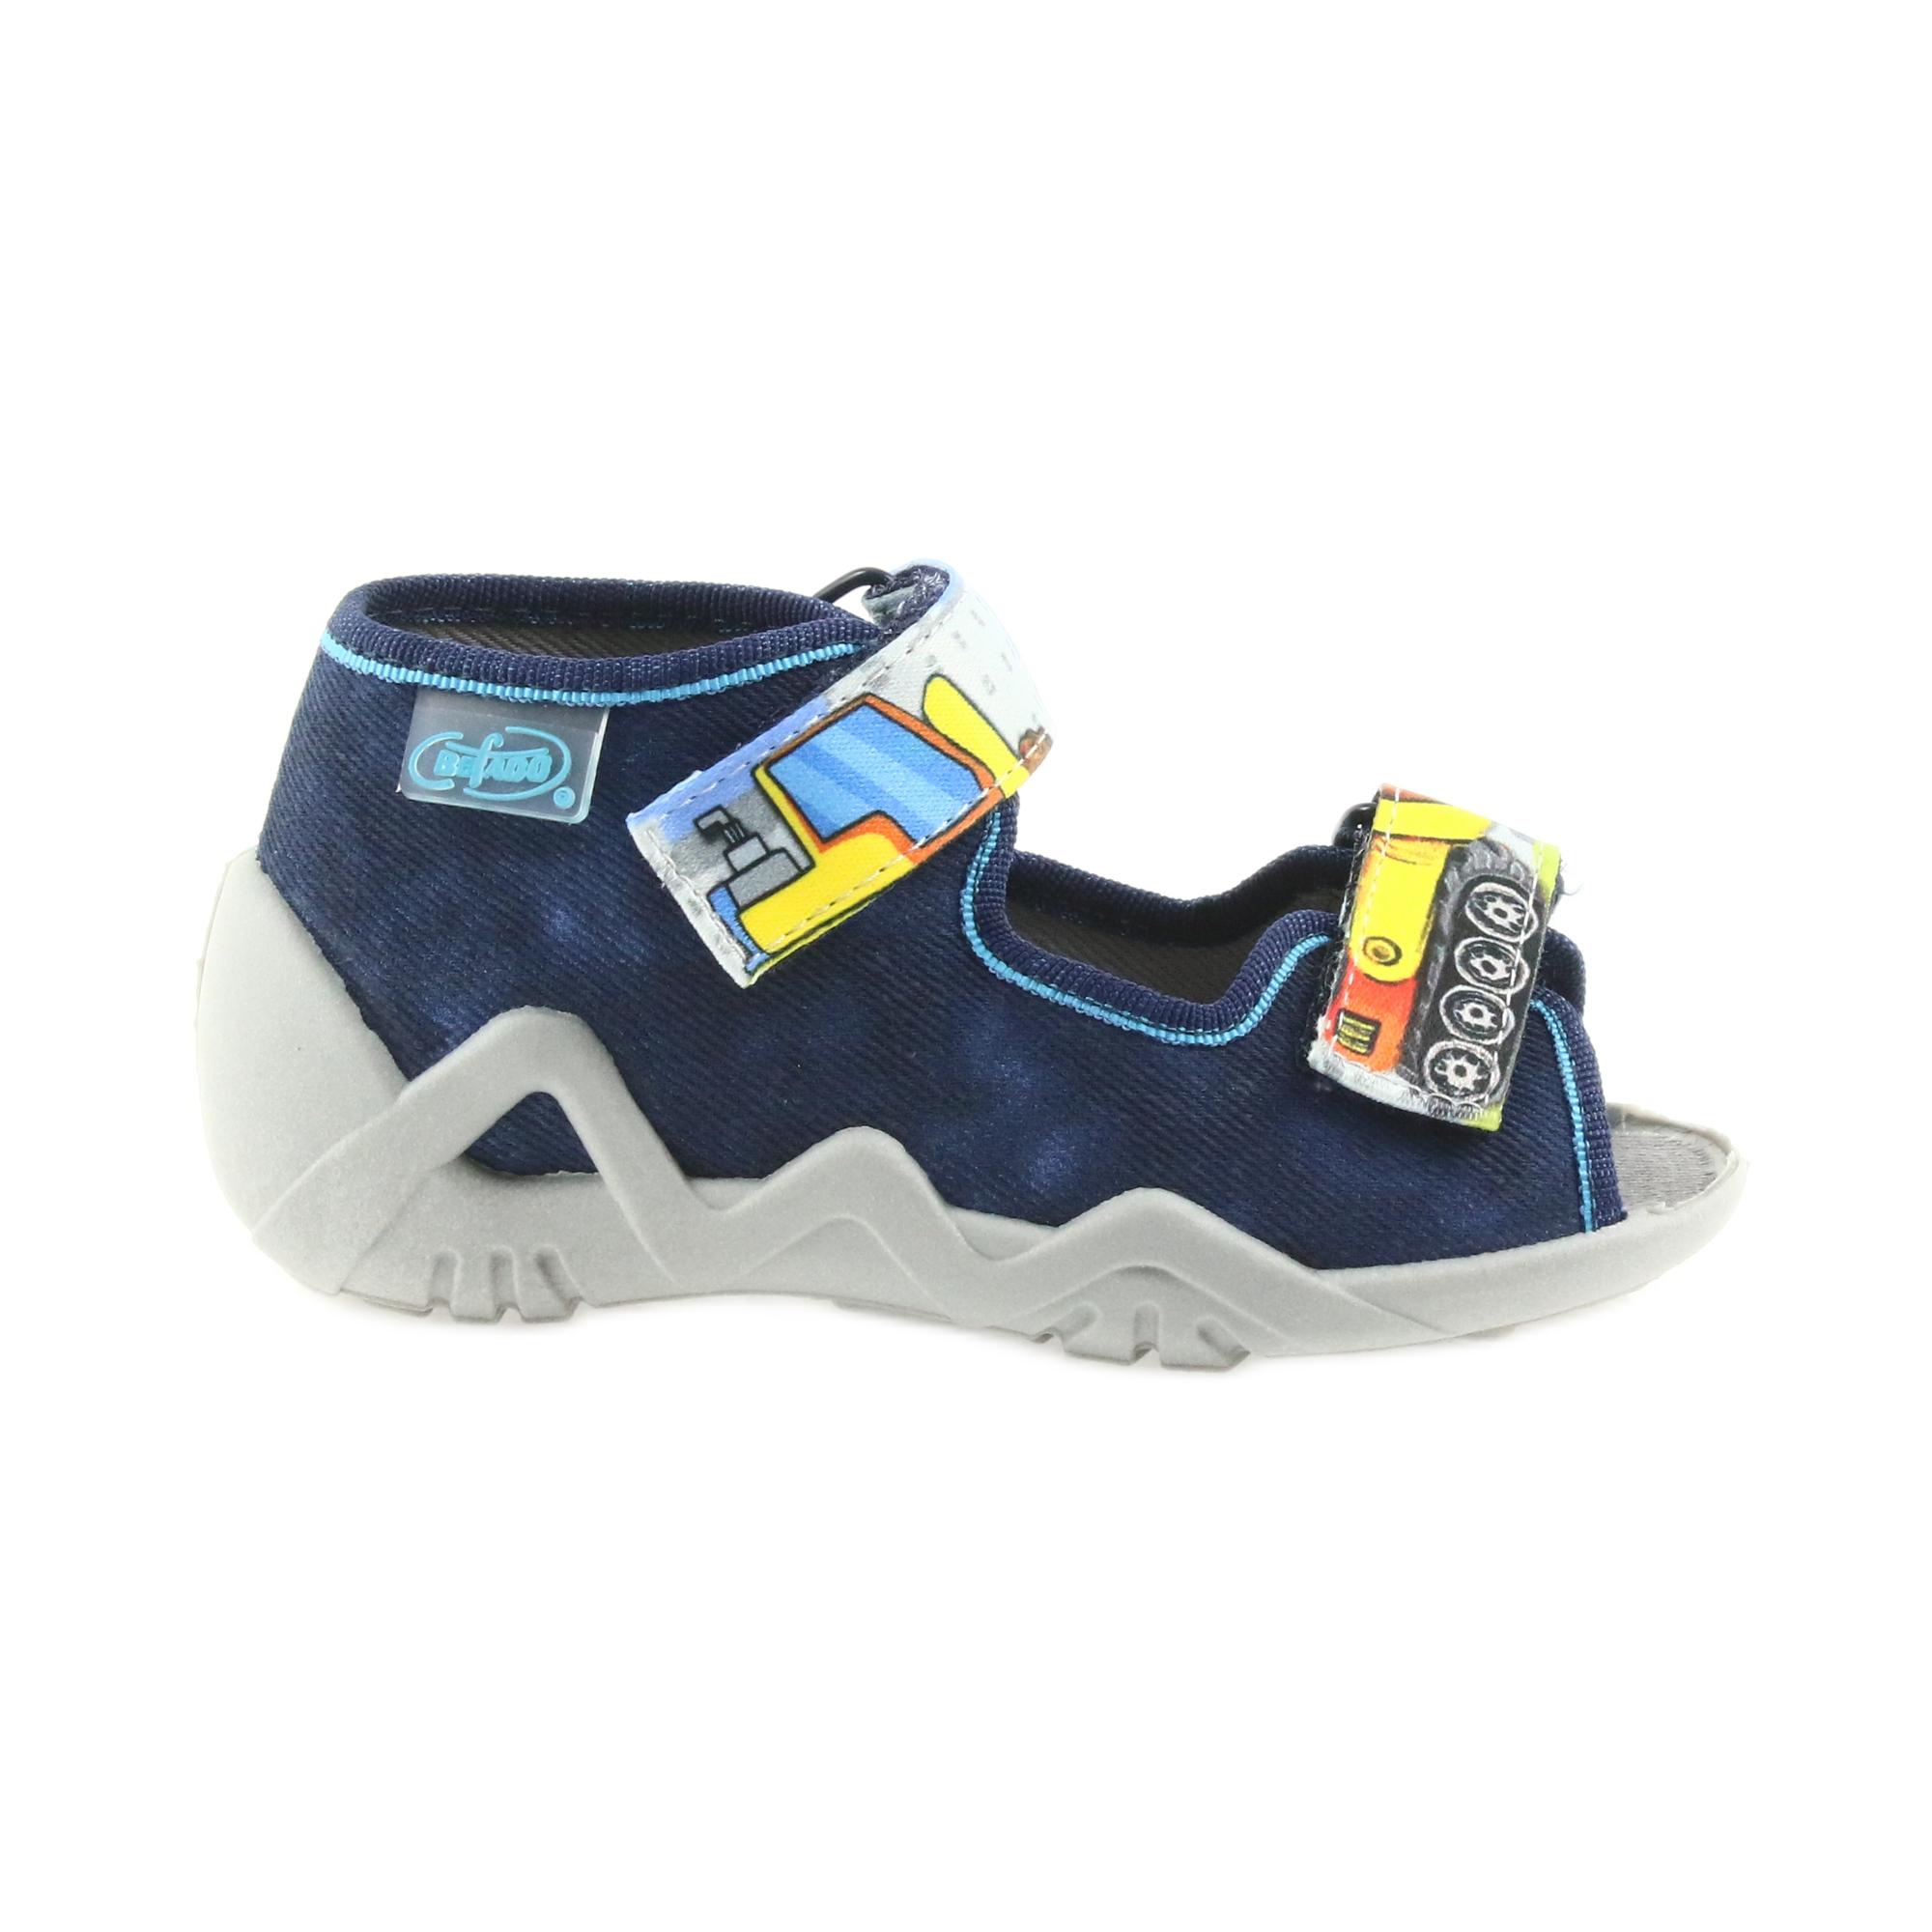 0f96cf938e83 Marina Sandali Befado sandali scarpe per bambini 250P077 - ButyModne.pl